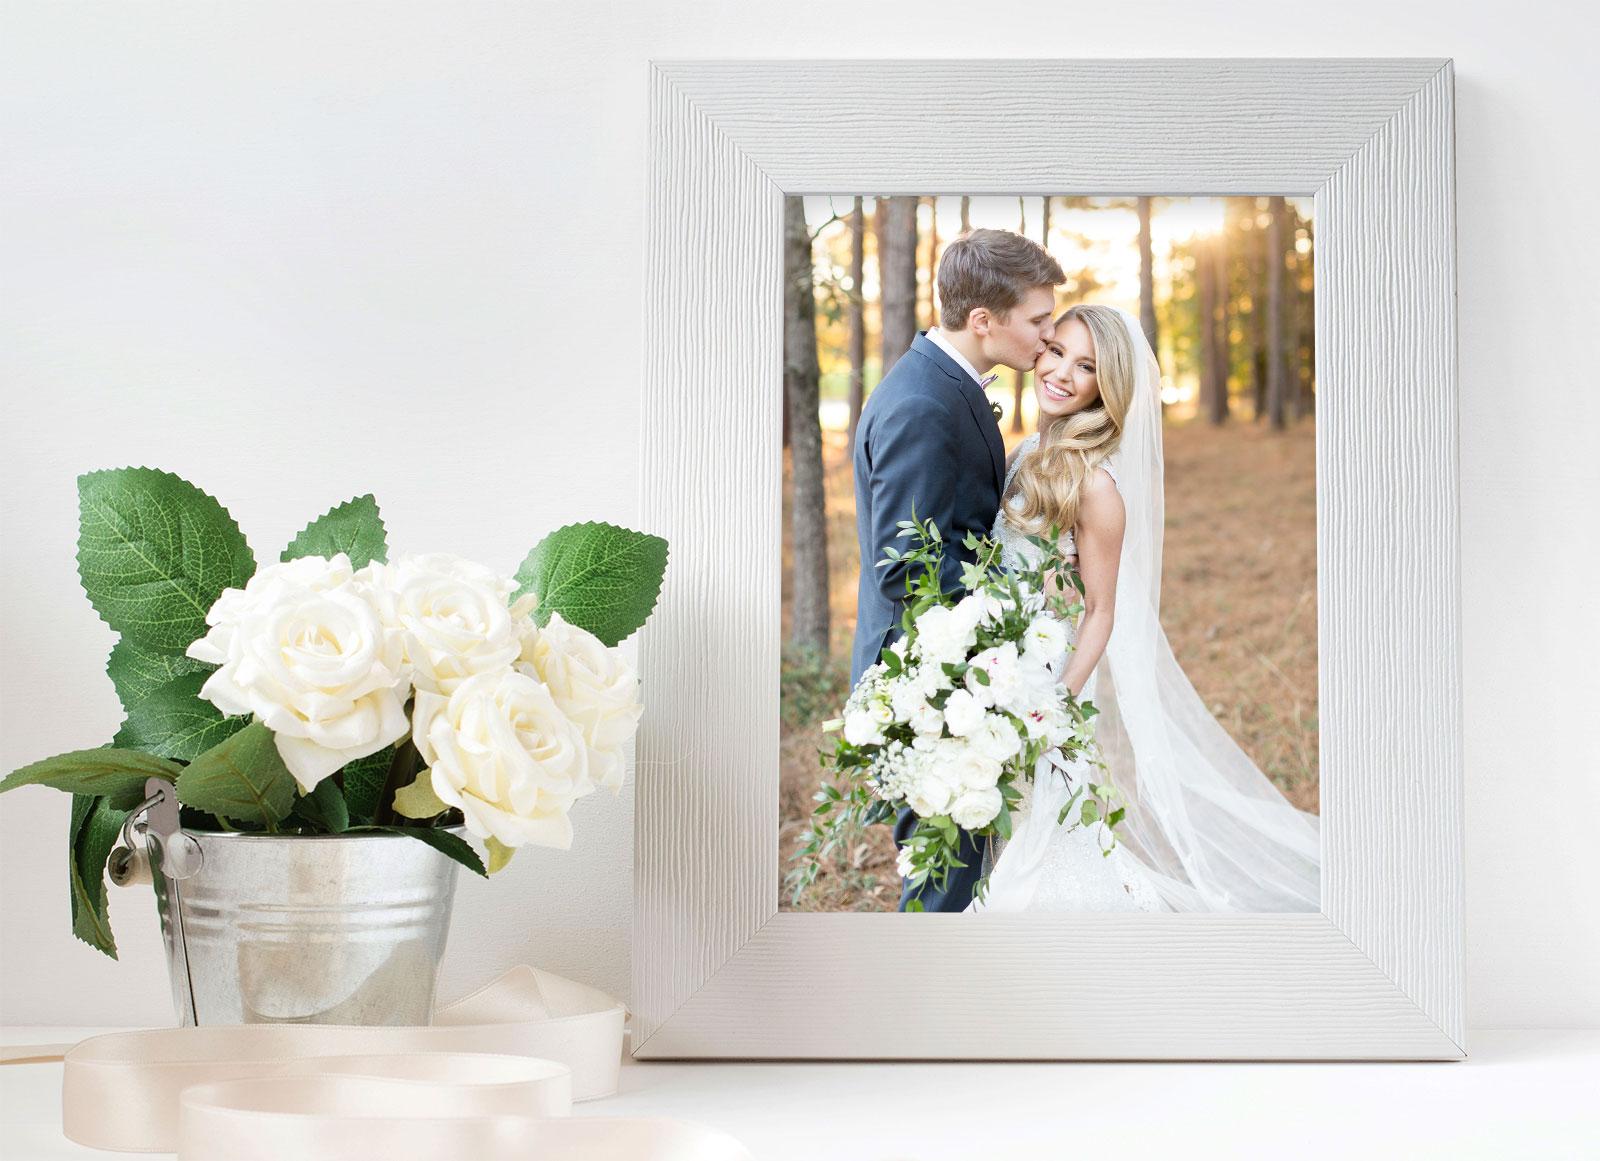 Free Beautiful Photo Frame PSD Mockup for Photos, Illustrations ...